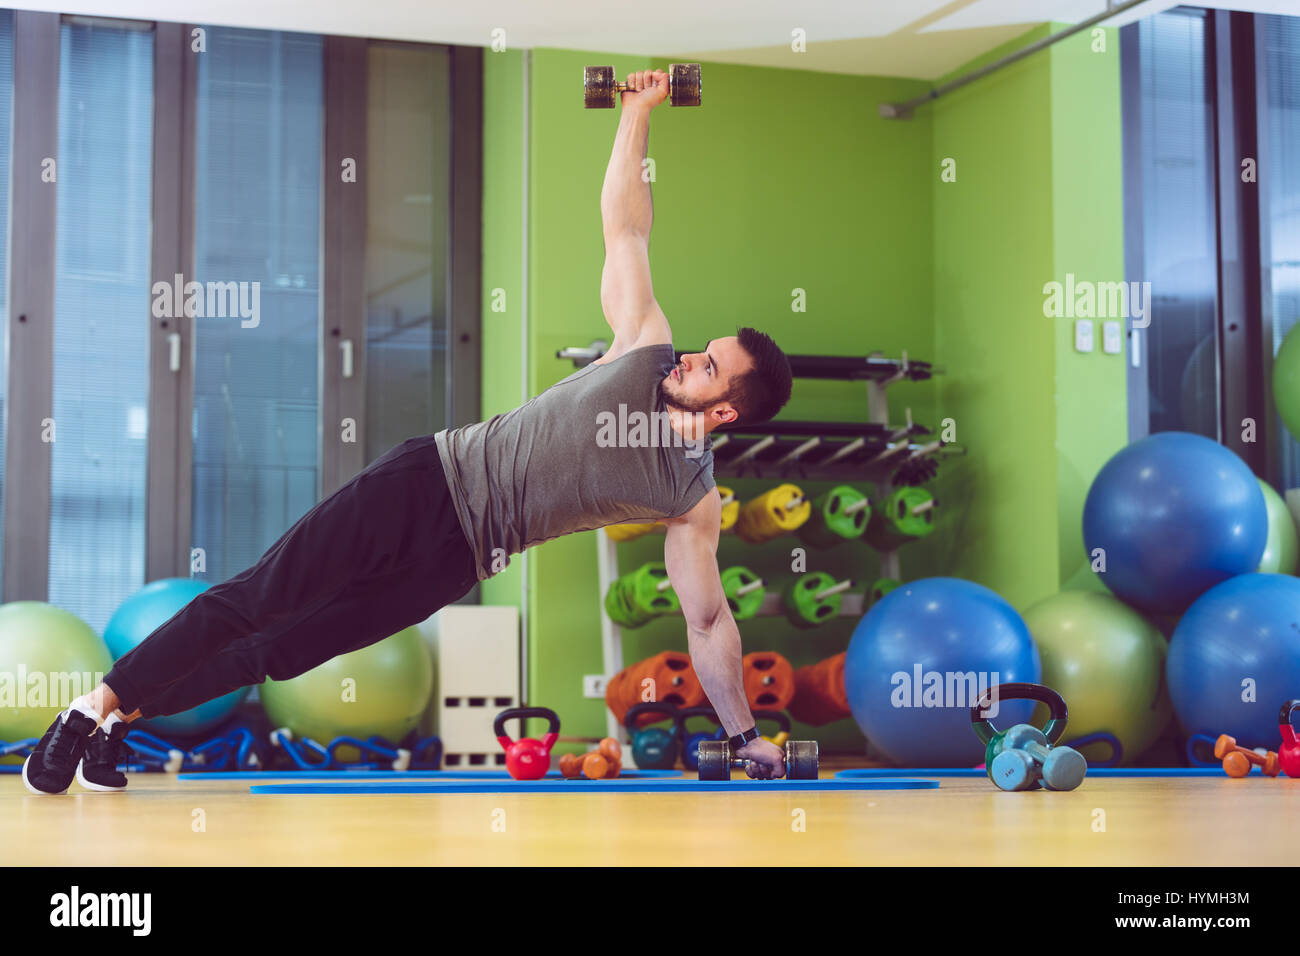 Joven levantar pesa en el gimnasio Imagen De Stock